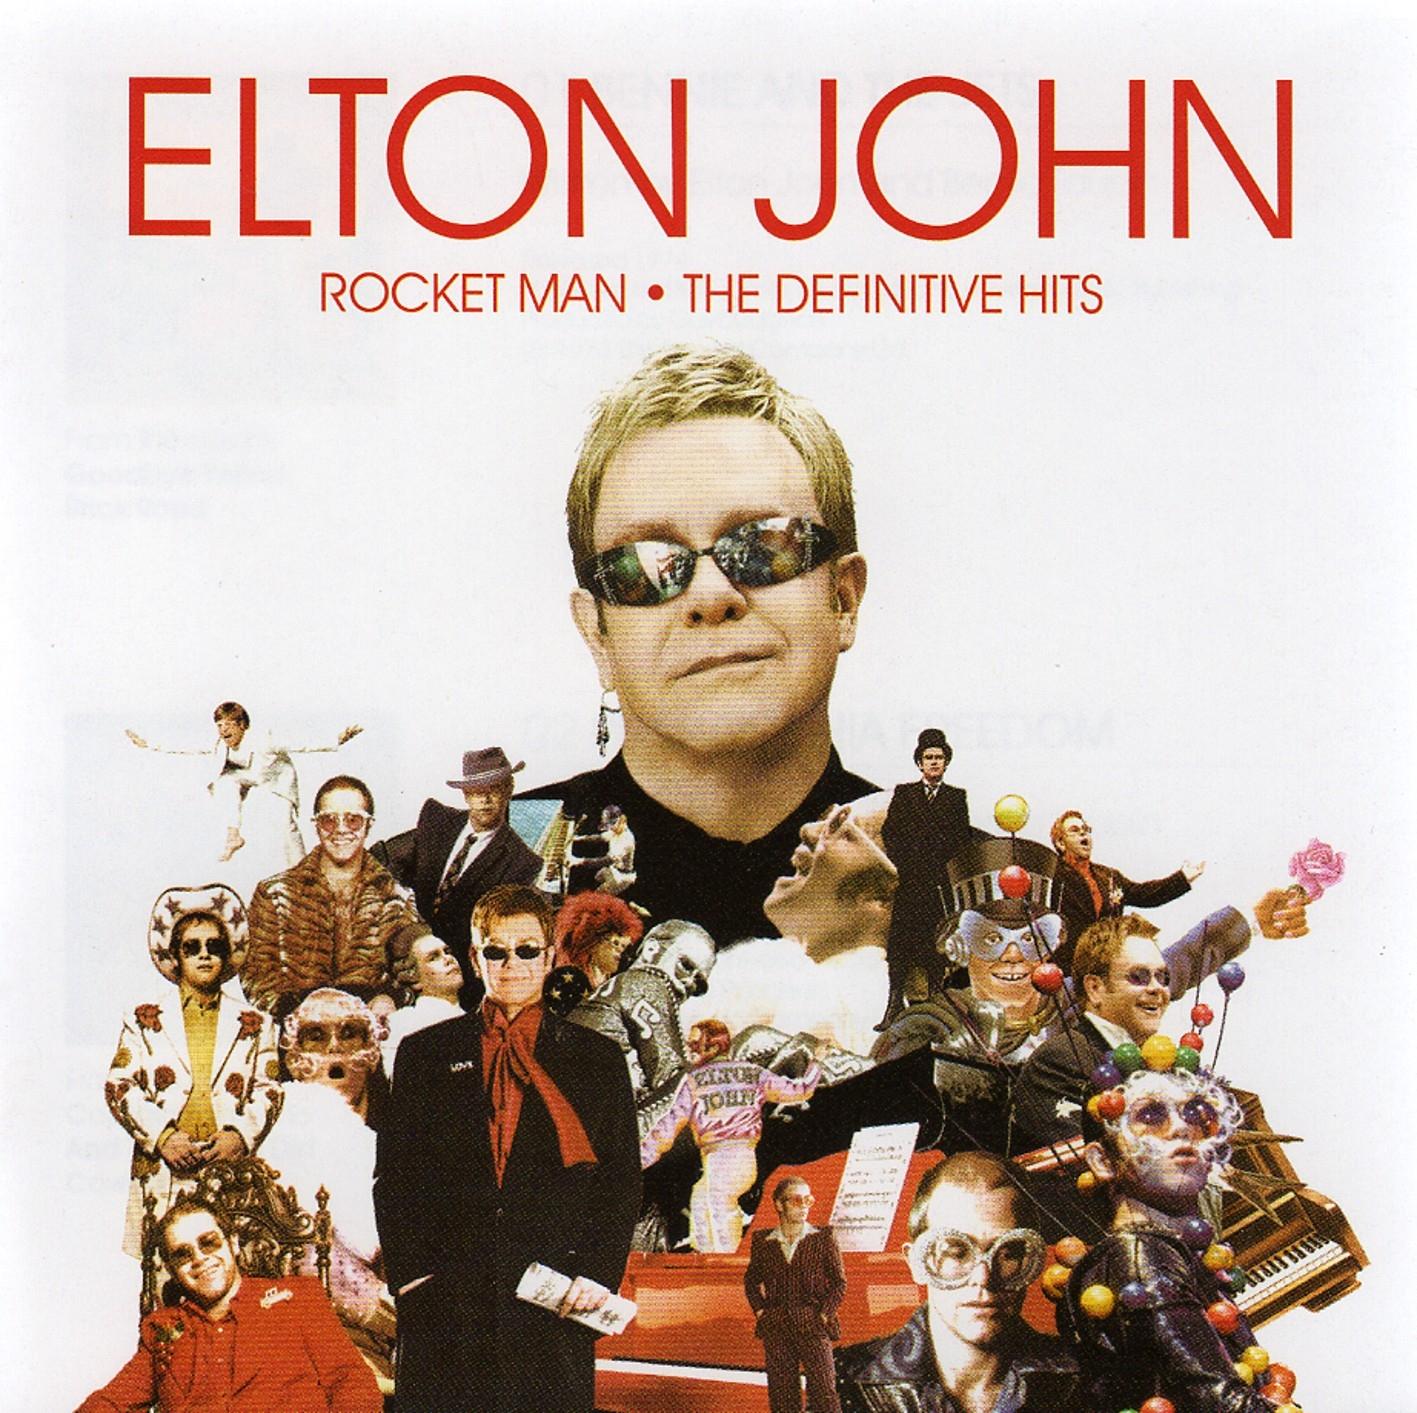 John bet at home przydać zawartość bet at home Lennon